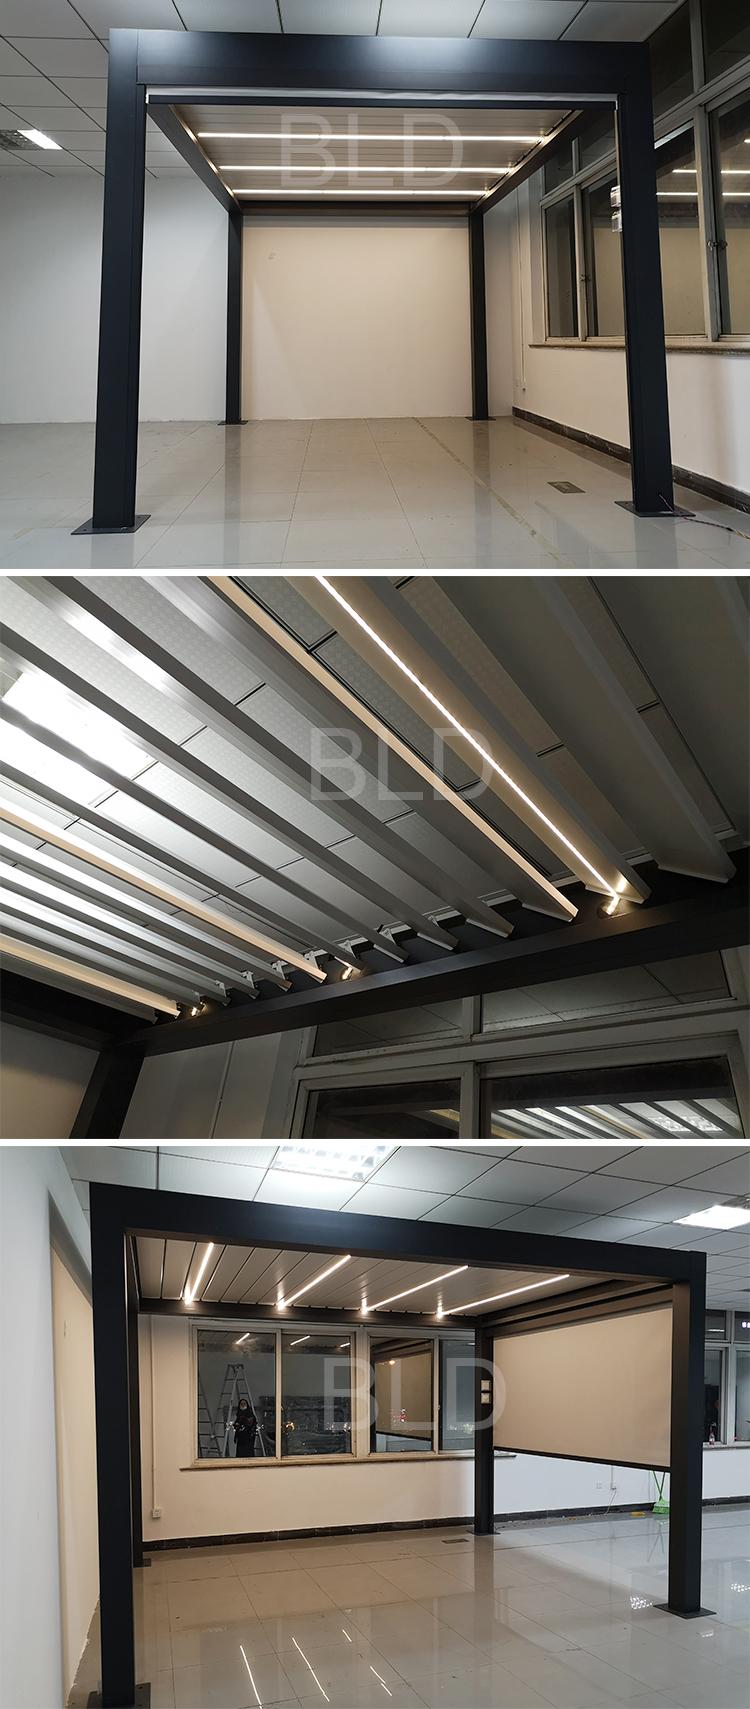 Modern Bioclimatic Motorised Pergola Aluminium Louvre Opening Roof With Remote Control